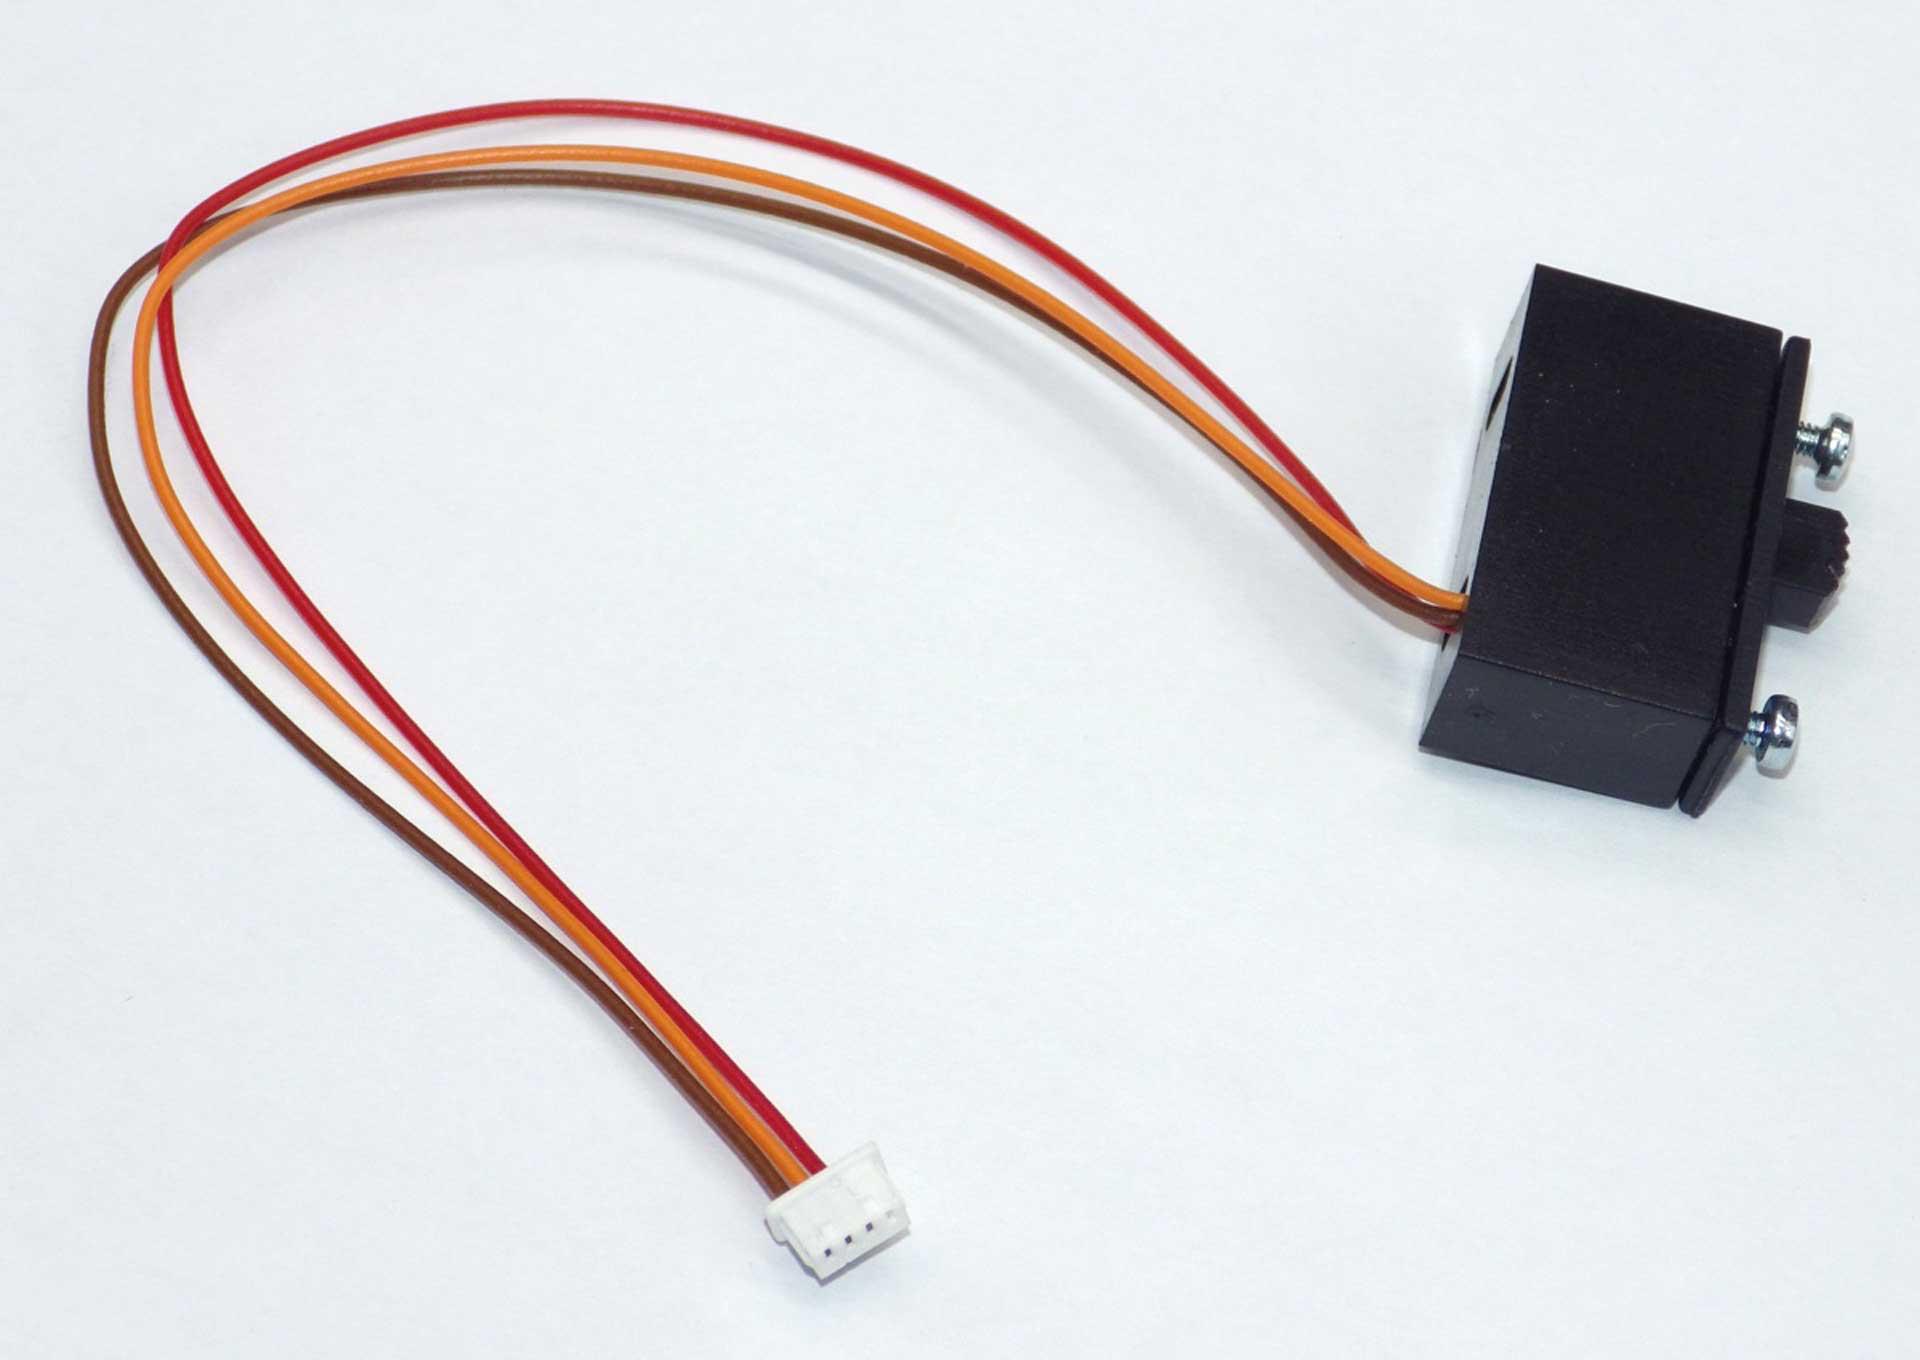 ACT Extern-Schalter V2 für DPS/PS-V2-Systeme